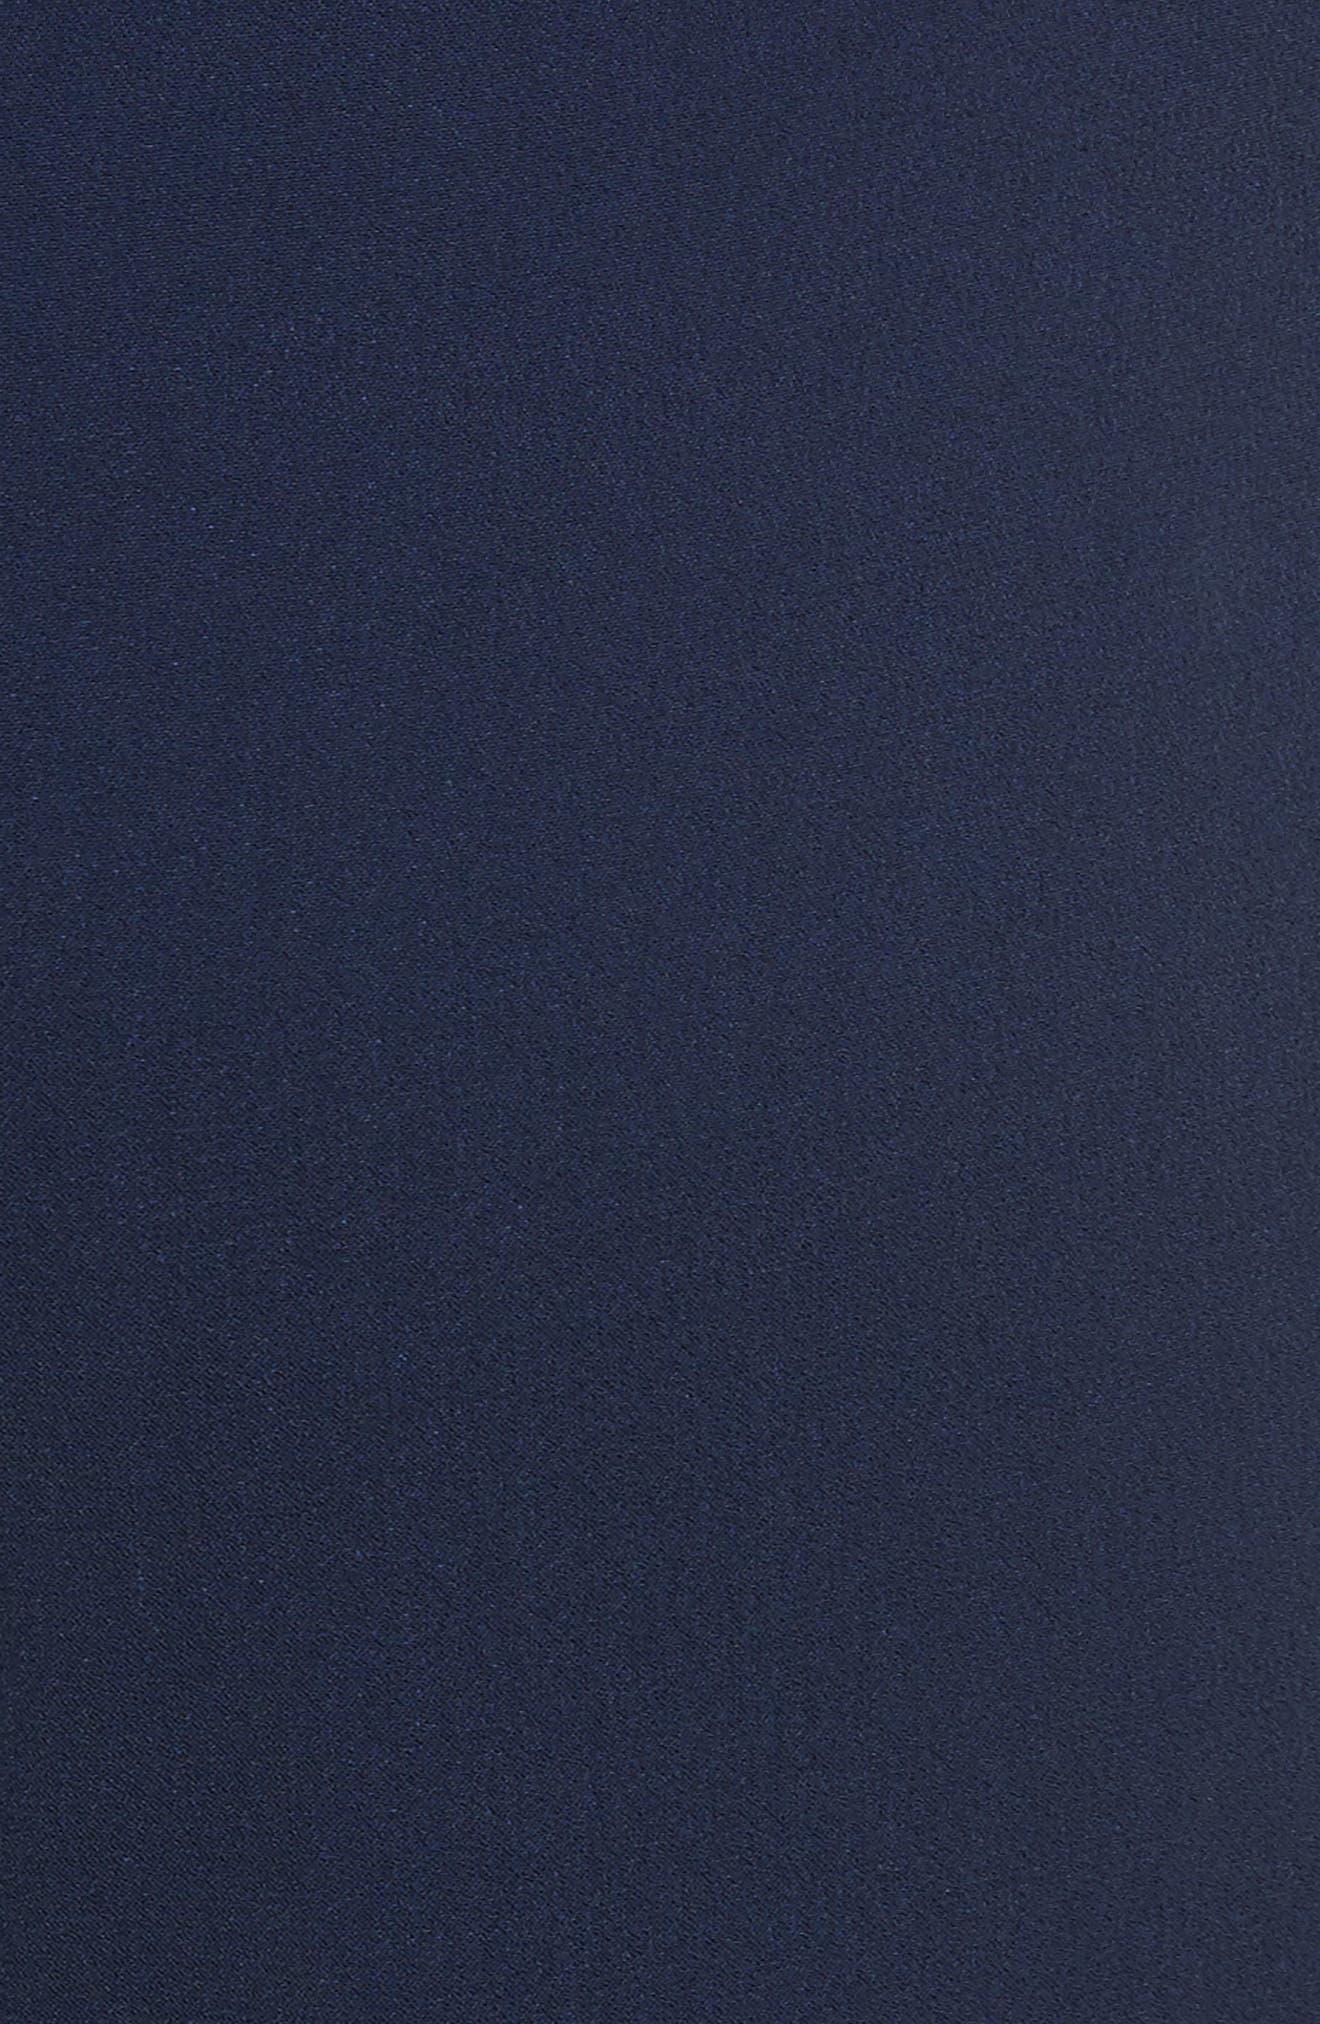 Adley Sailor Pants,                             Alternate thumbnail 6, color,                             Navy